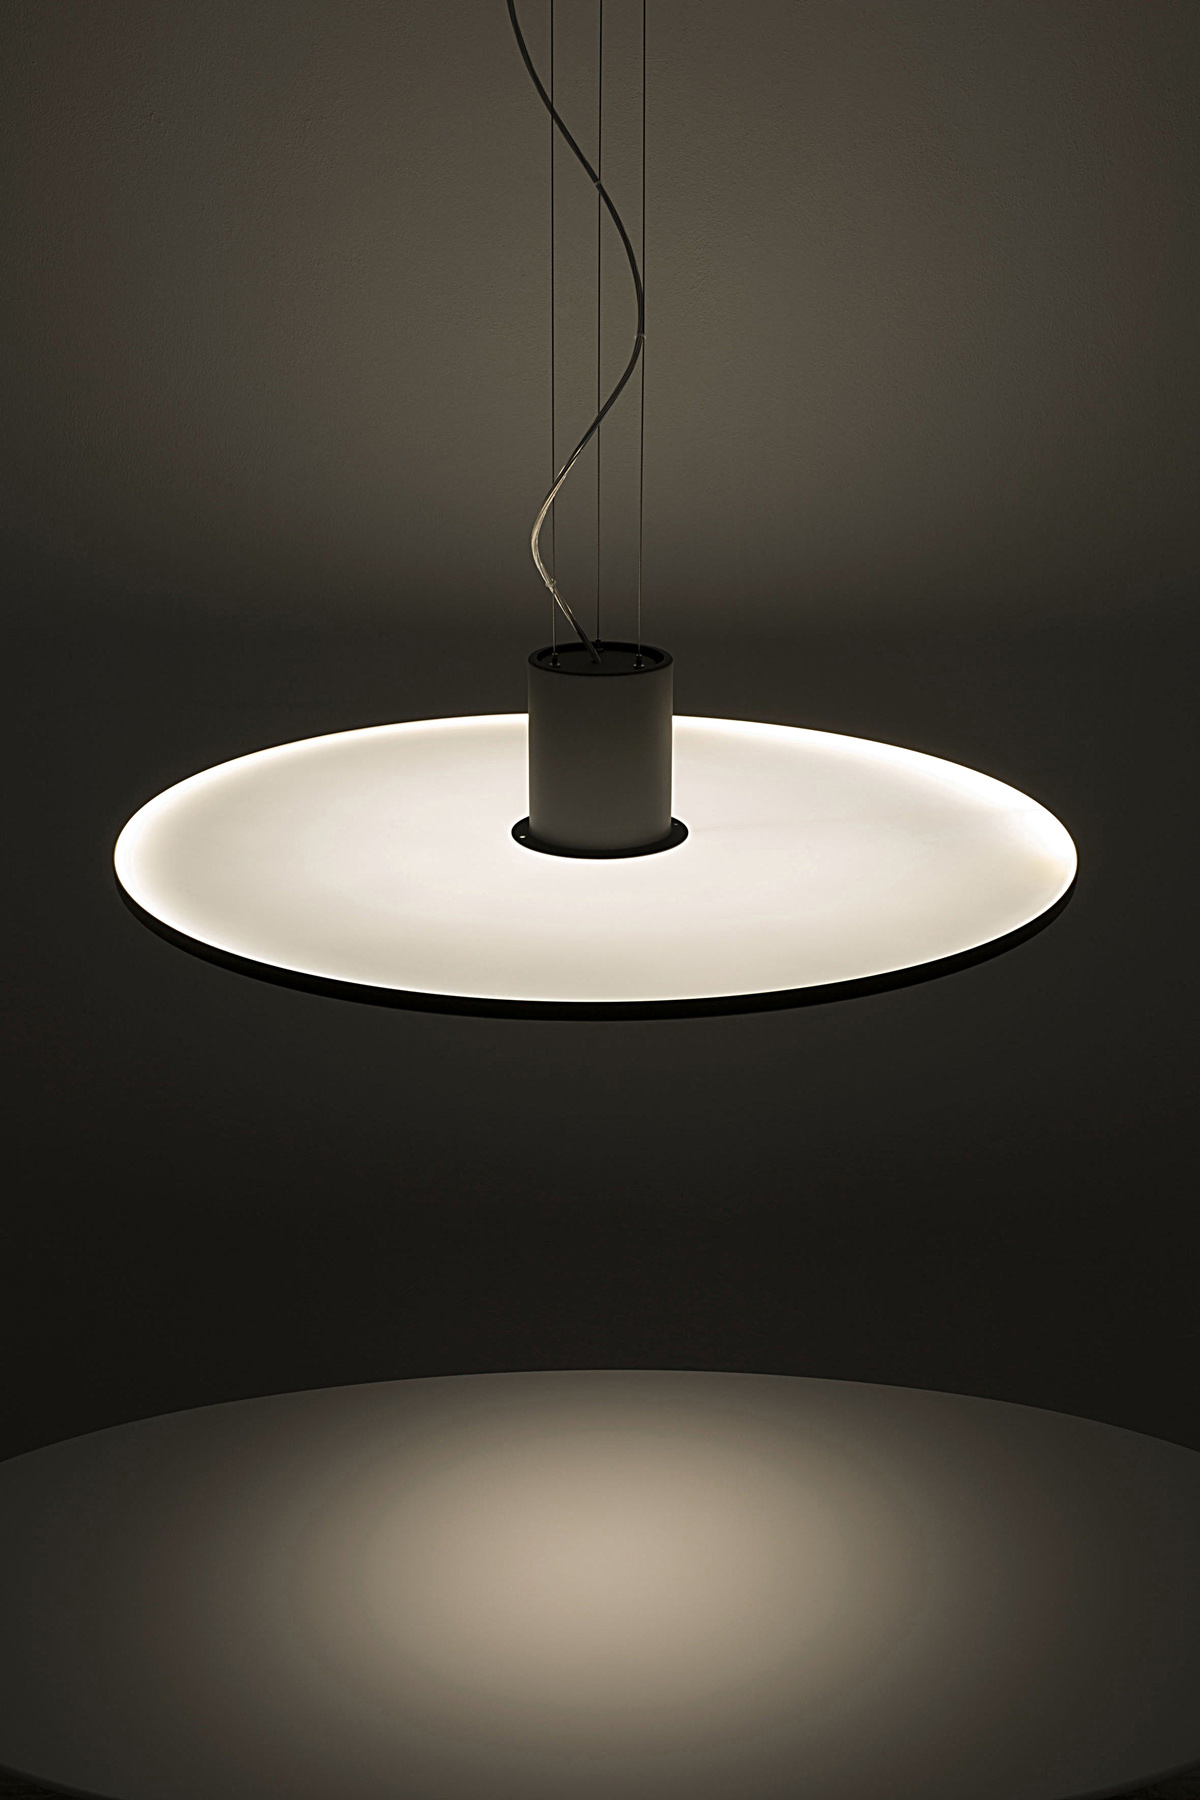 lampada led design